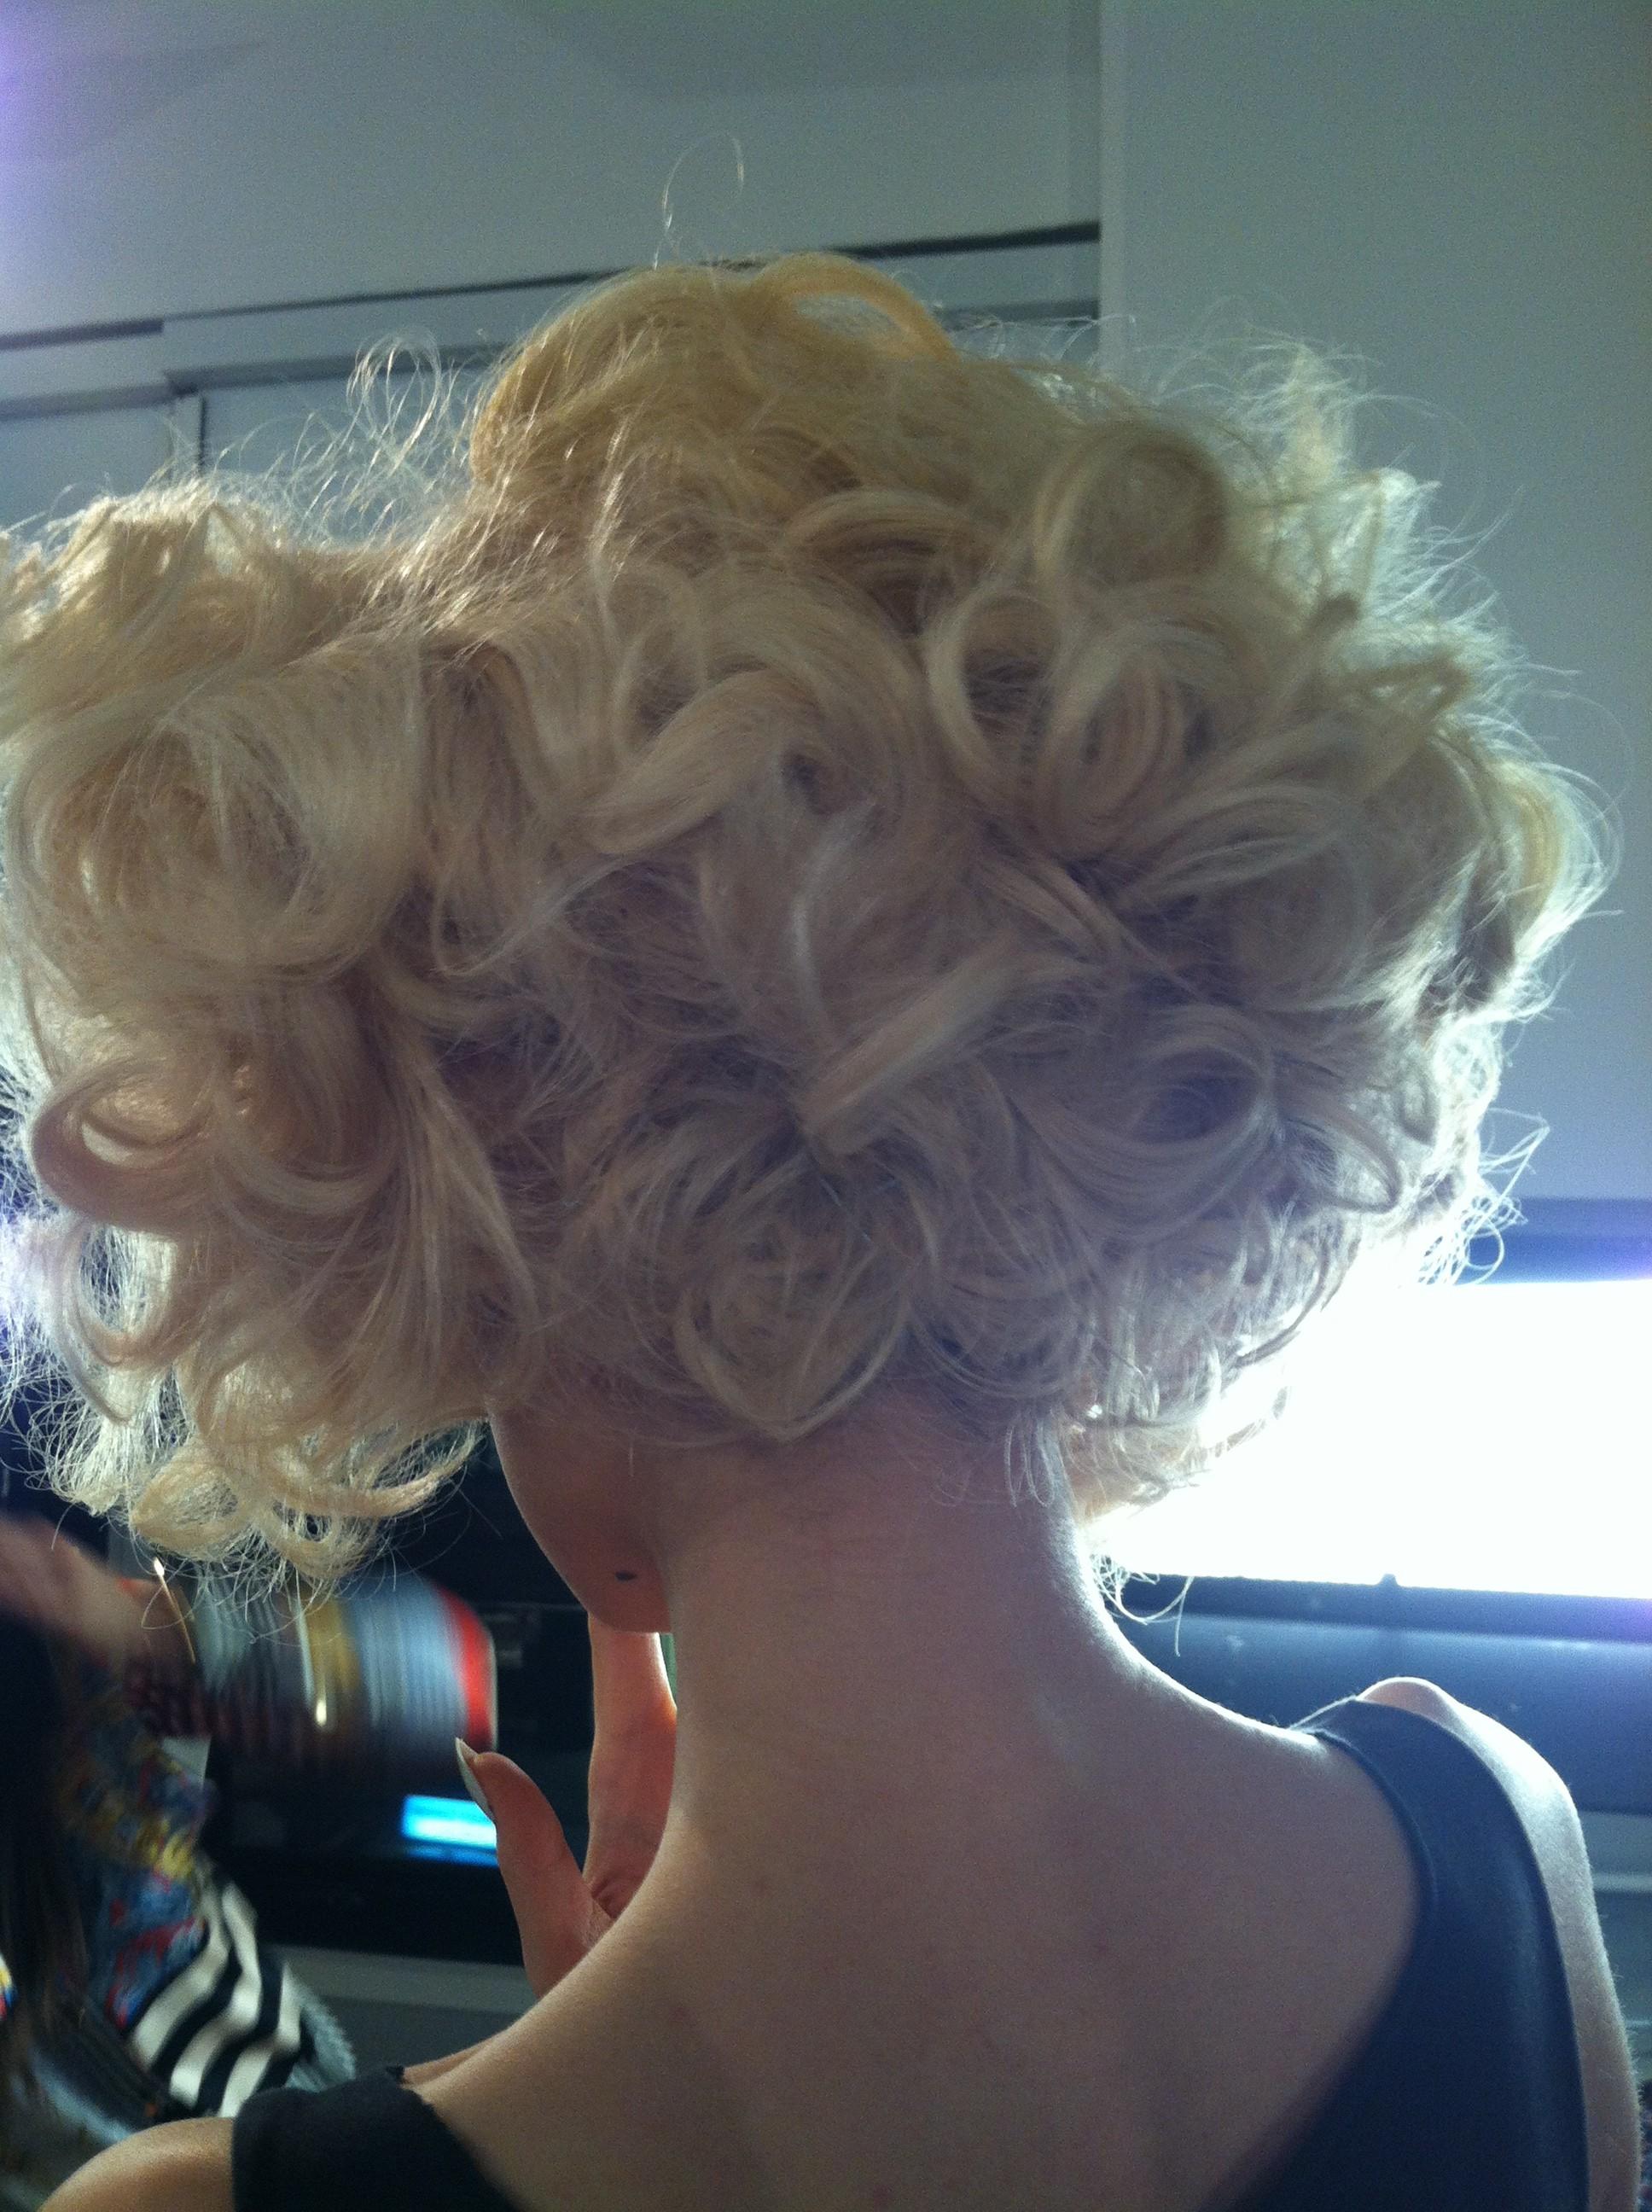 A disheveled curly back